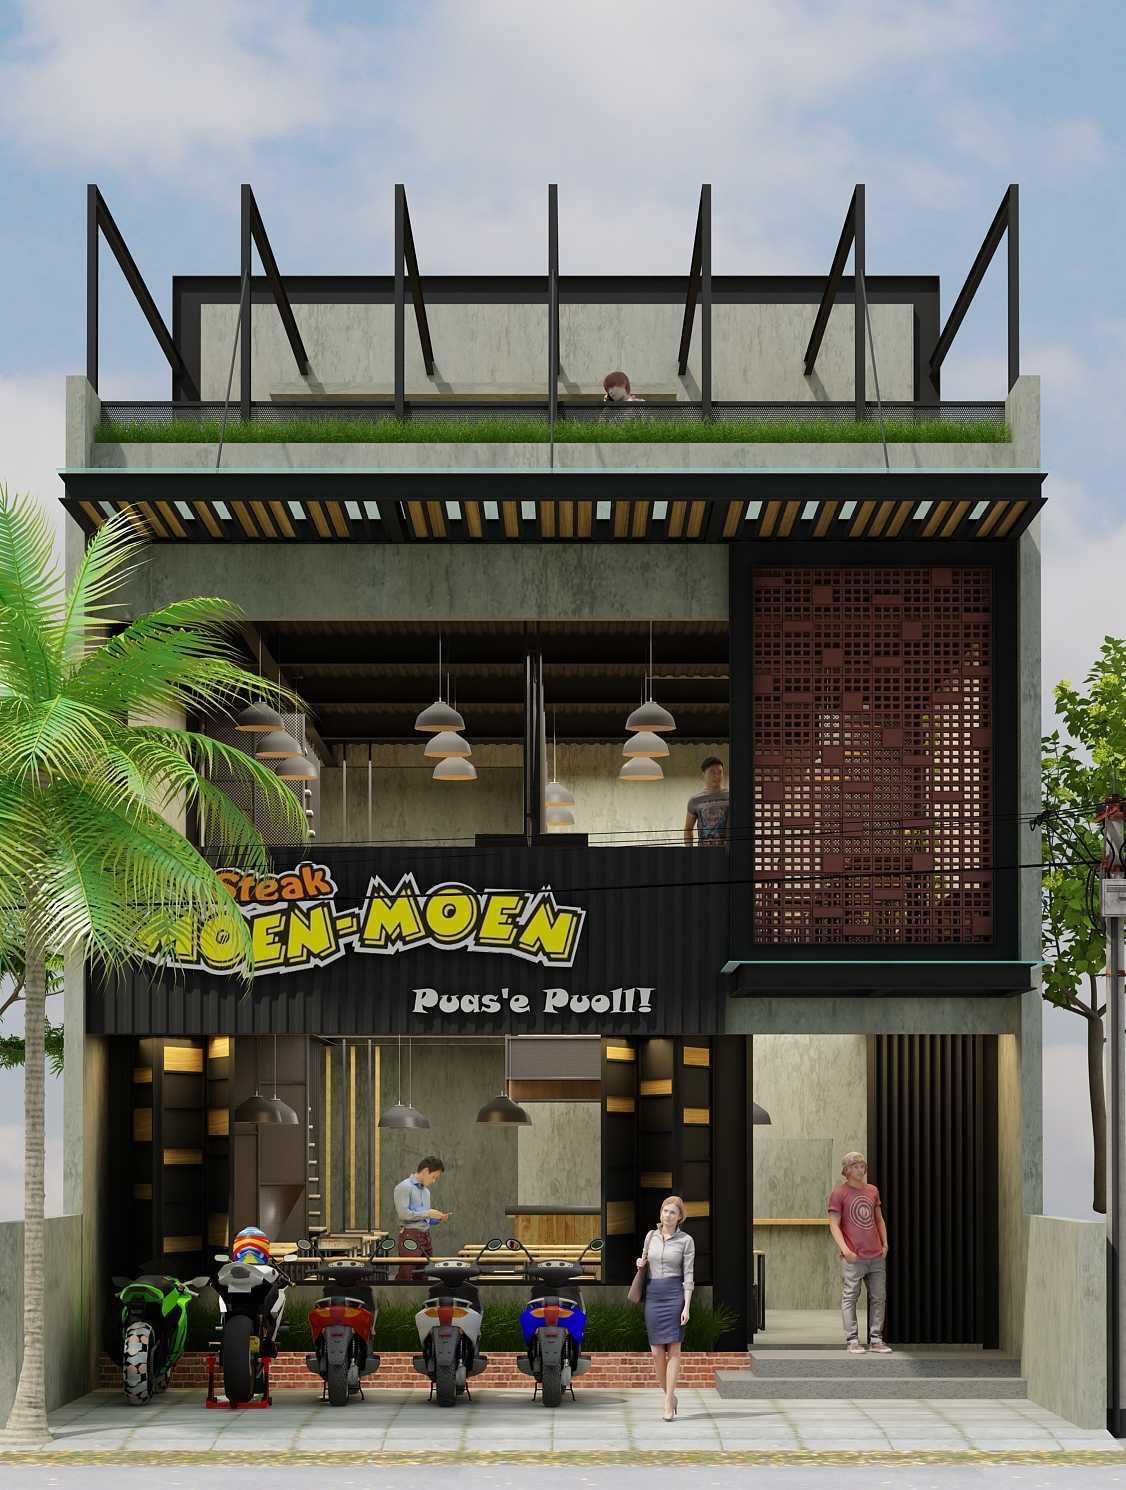 Conarch Bangun Sejahtera Steak Moen Moen Mojosongo Kota Surakarta, Jawa Tengah, Indonesia Kota Surakarta, Jawa Tengah, Indonesia Conarch-Bangun-Sejahtera-Steak-Moen-Moen-Mojosongo   60450